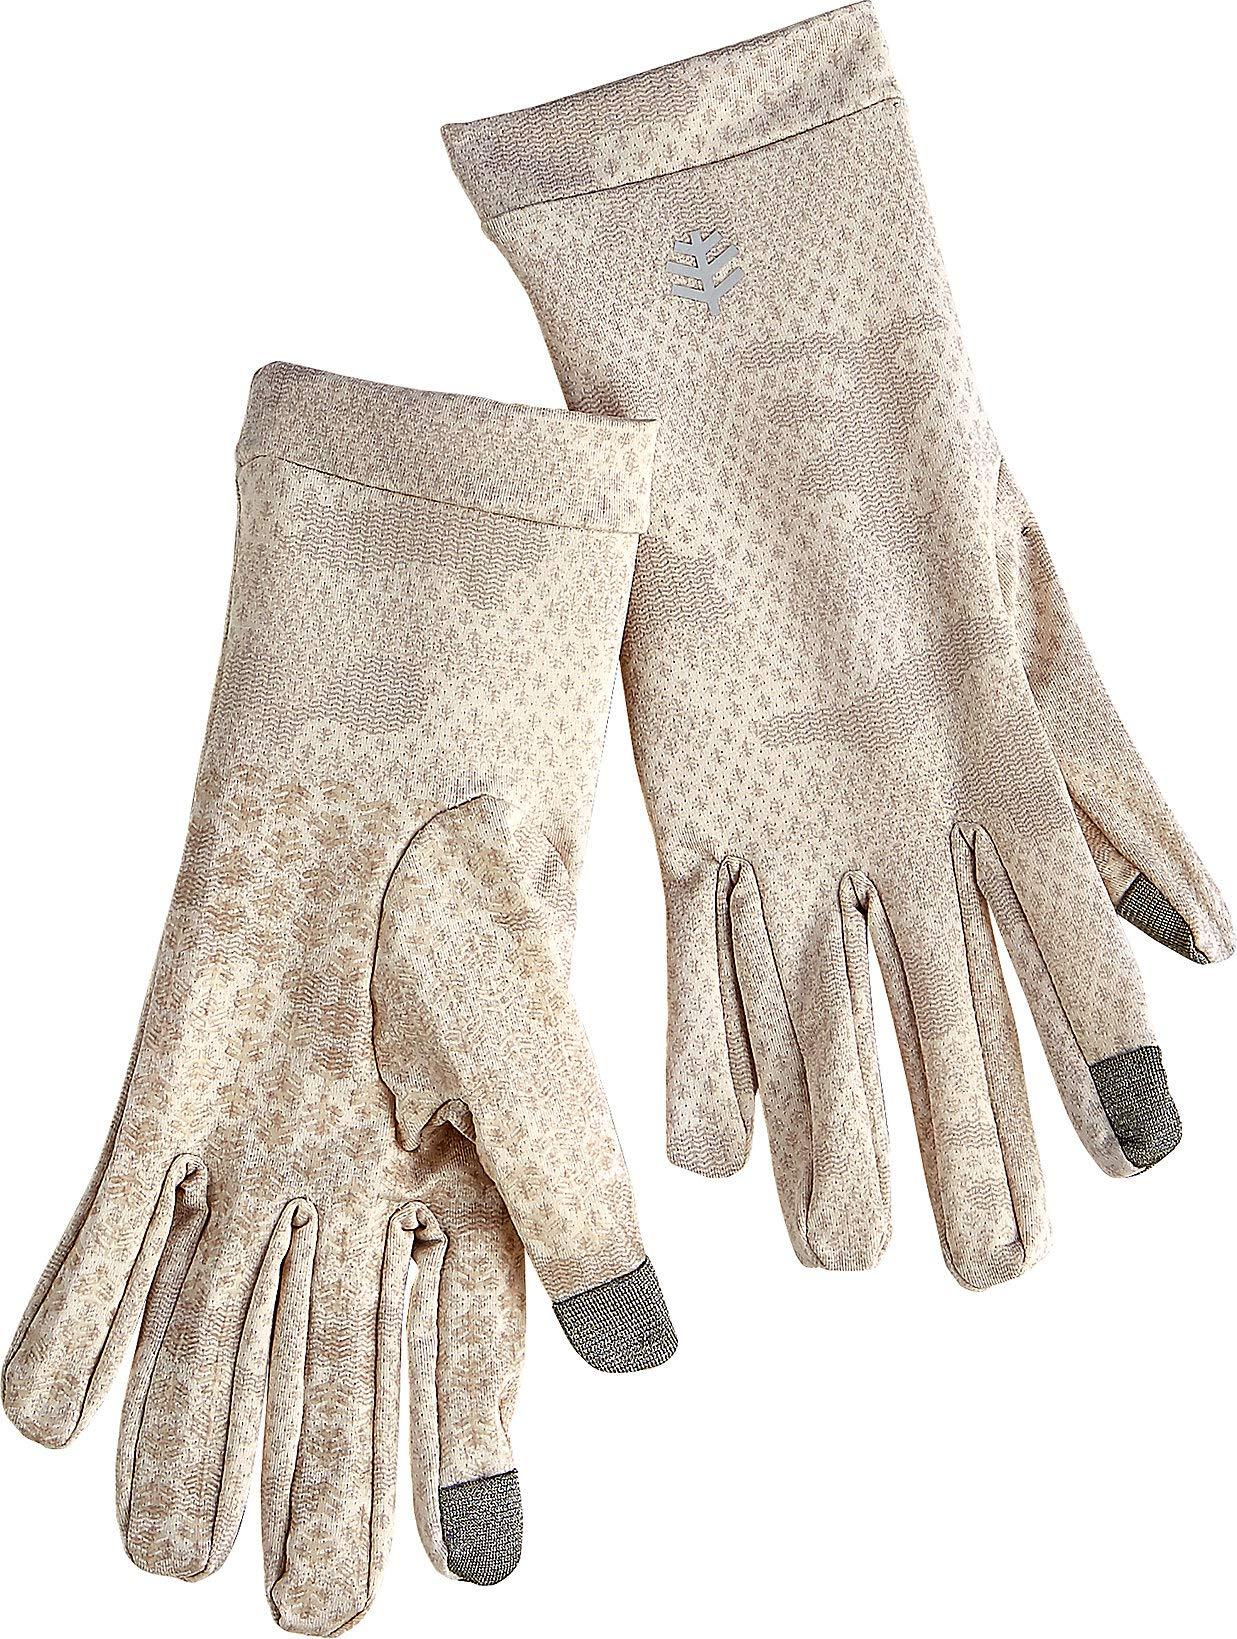 Coolibar UPF 50+ Unisex UV Gloves - Sun Protective (Small- Tan Coolibar Camo)